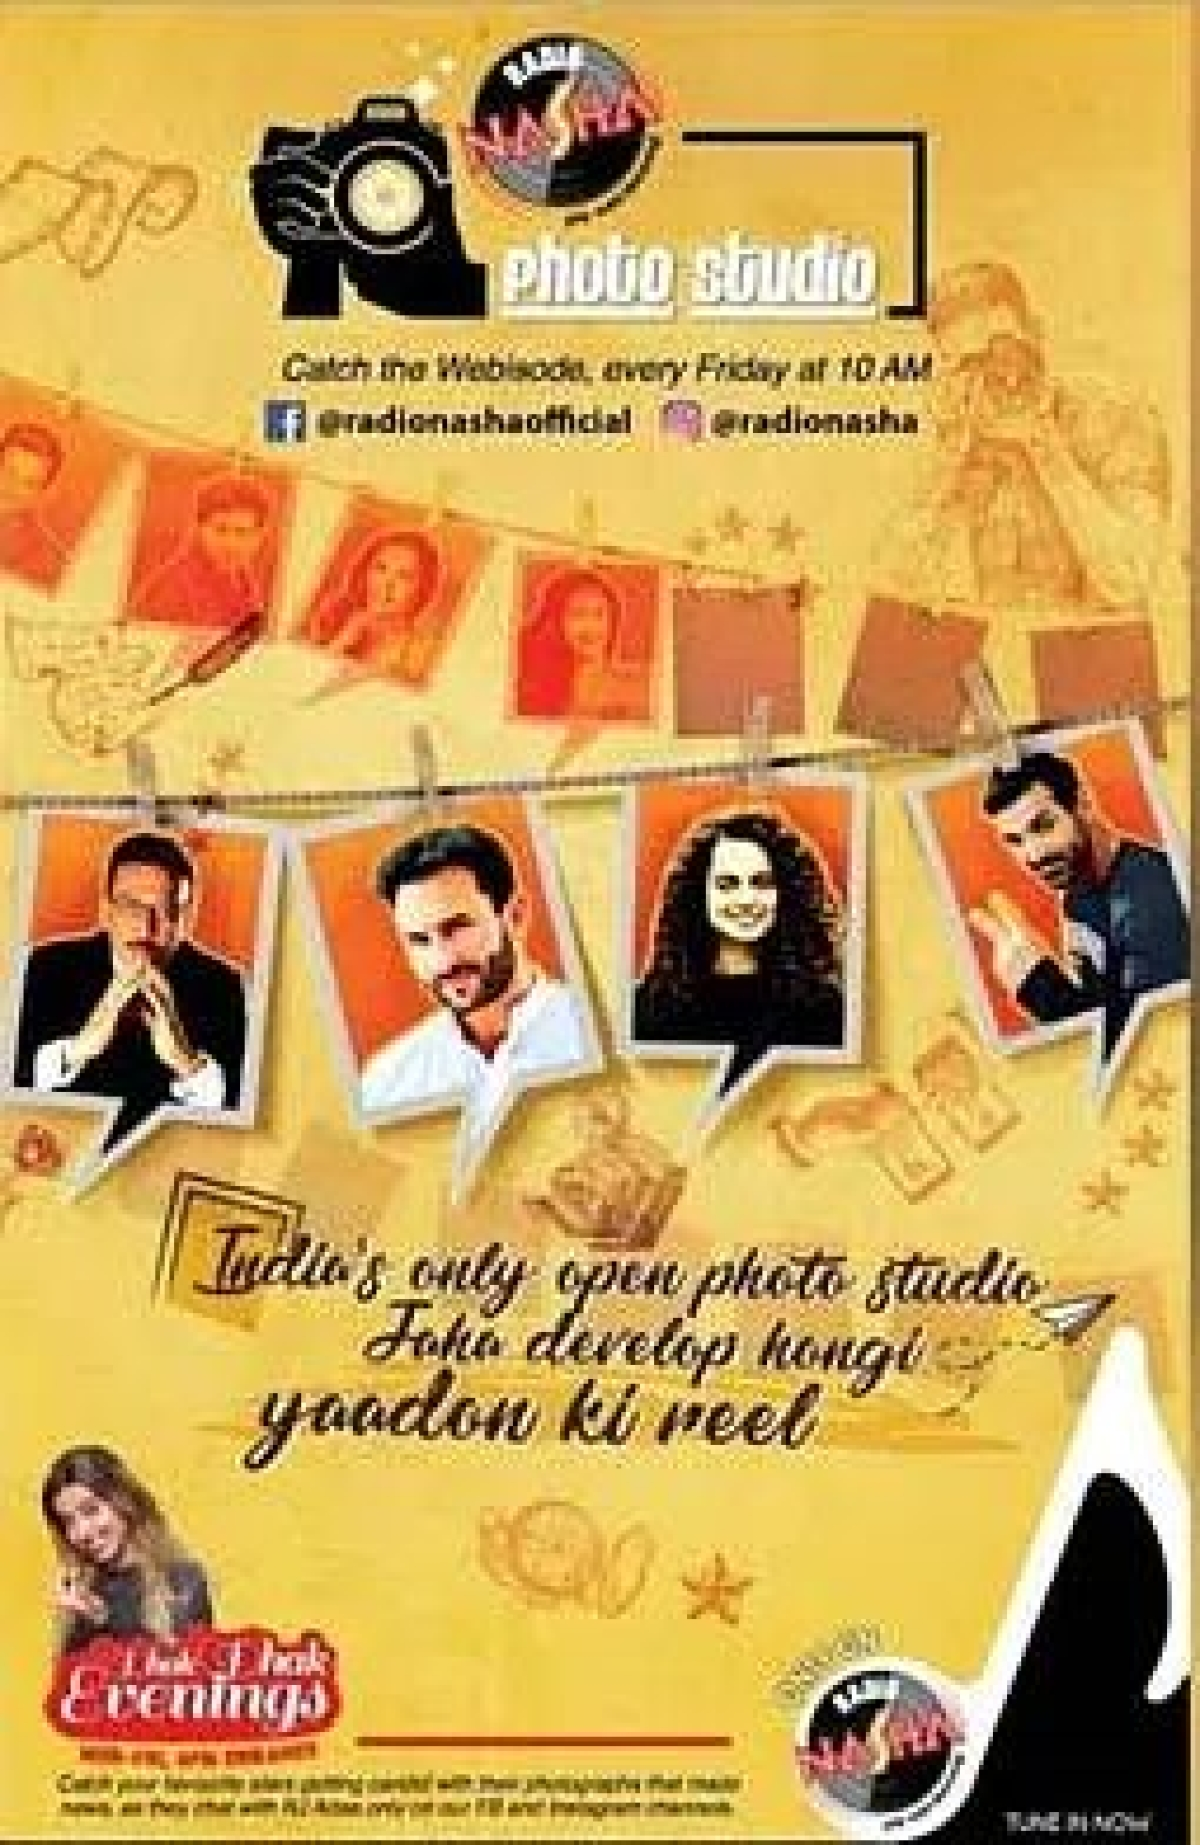 Radio Nasha launches Nasha Photo Studio, a trip down the memory lane with Bollywood superstars